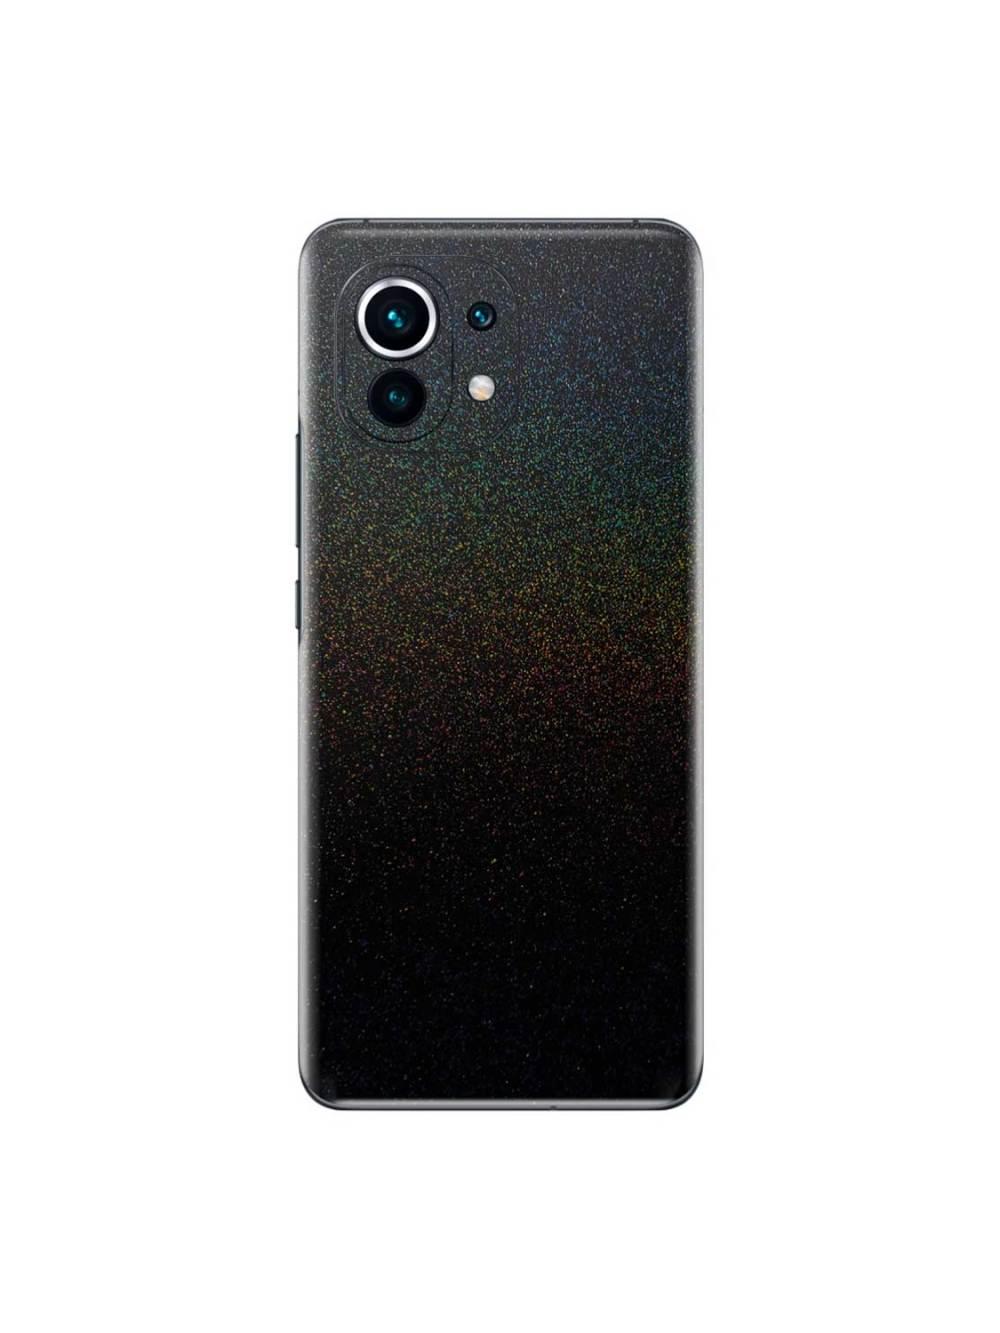 Xiaomi Mi 11 Skin Wrap